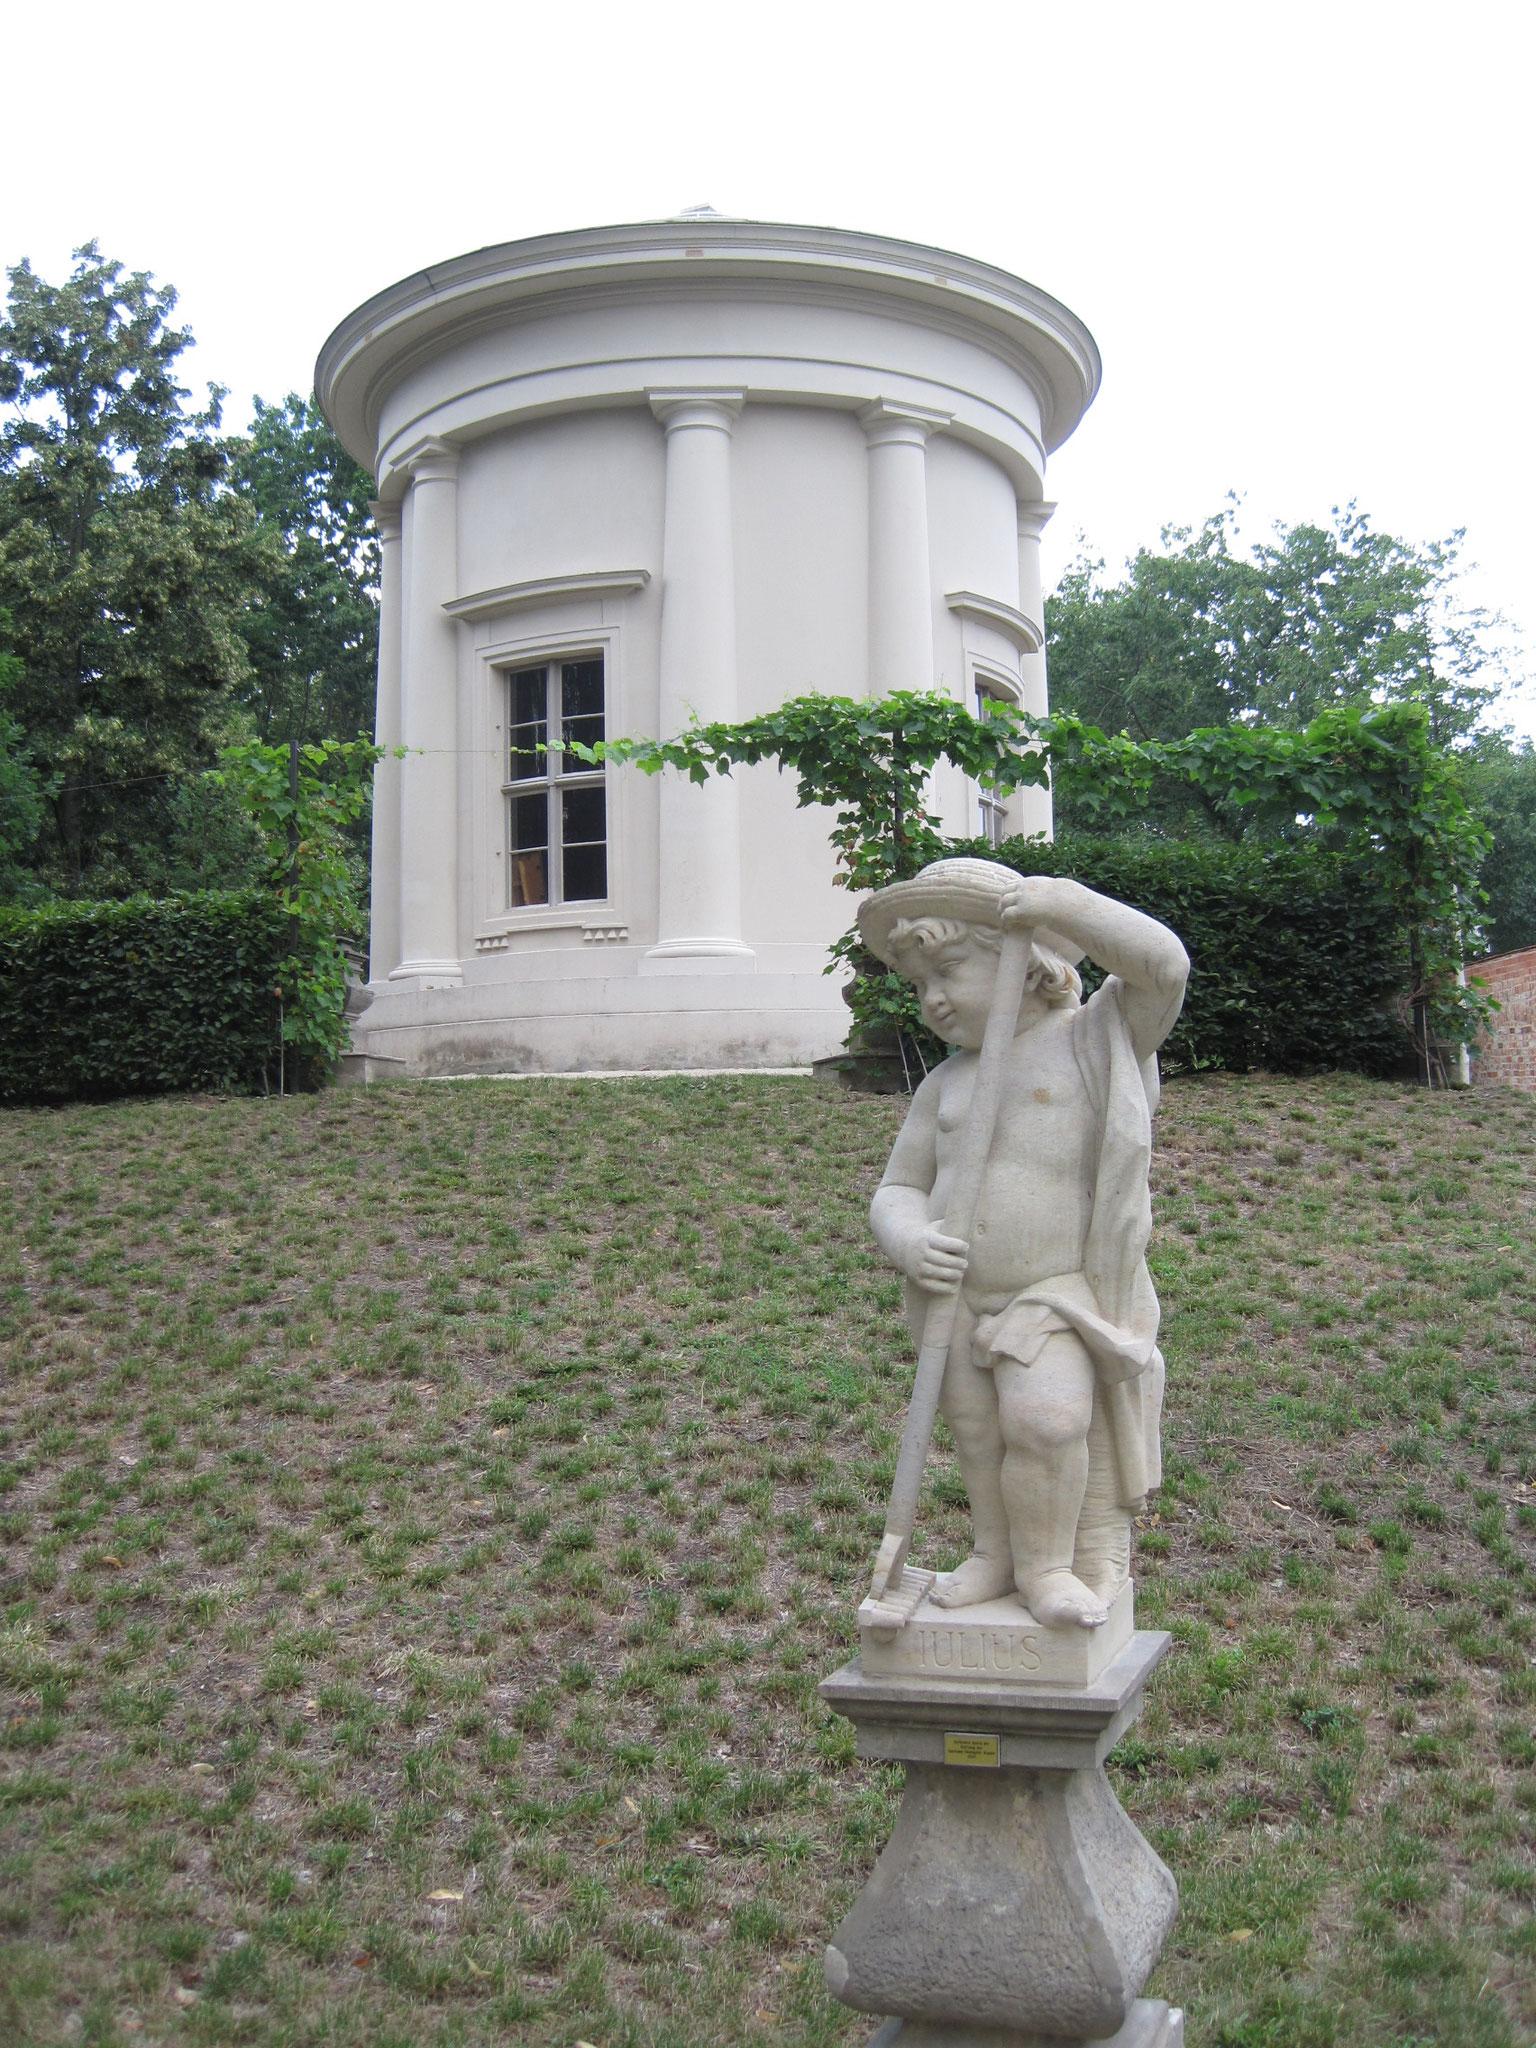 Sandsteinskulptur im Tempelgarten